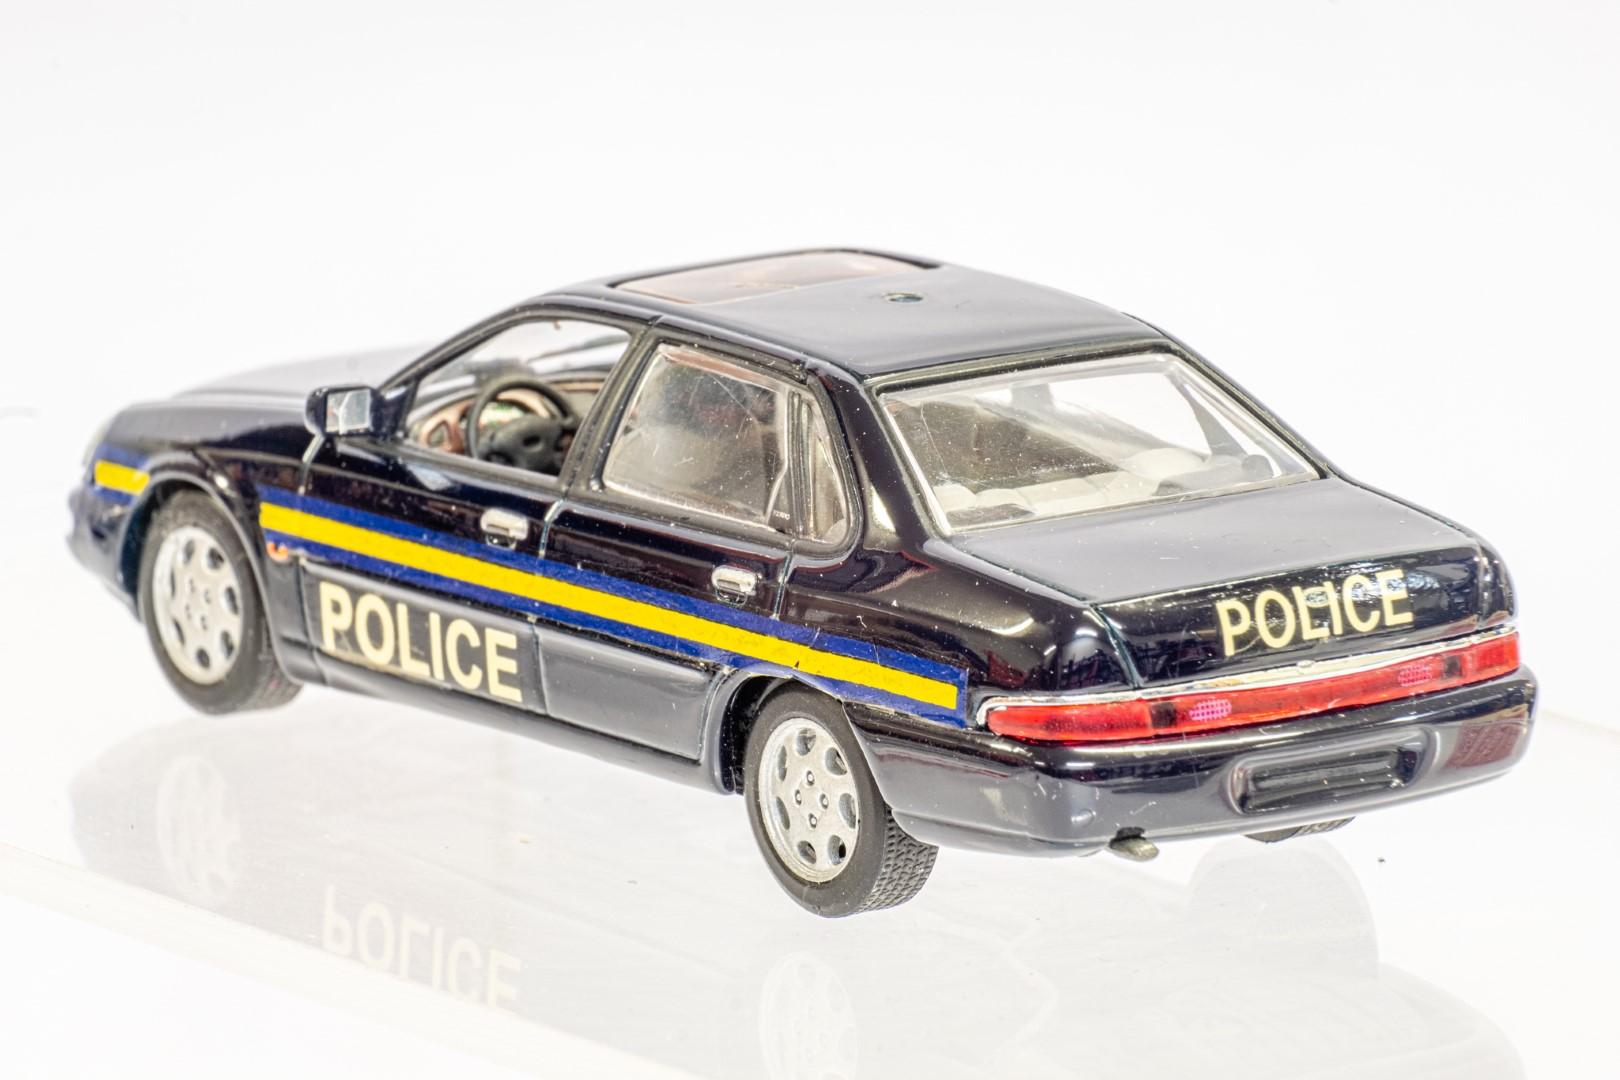 Automax Ford Granada - Police - Code 3 - Image 5 of 7